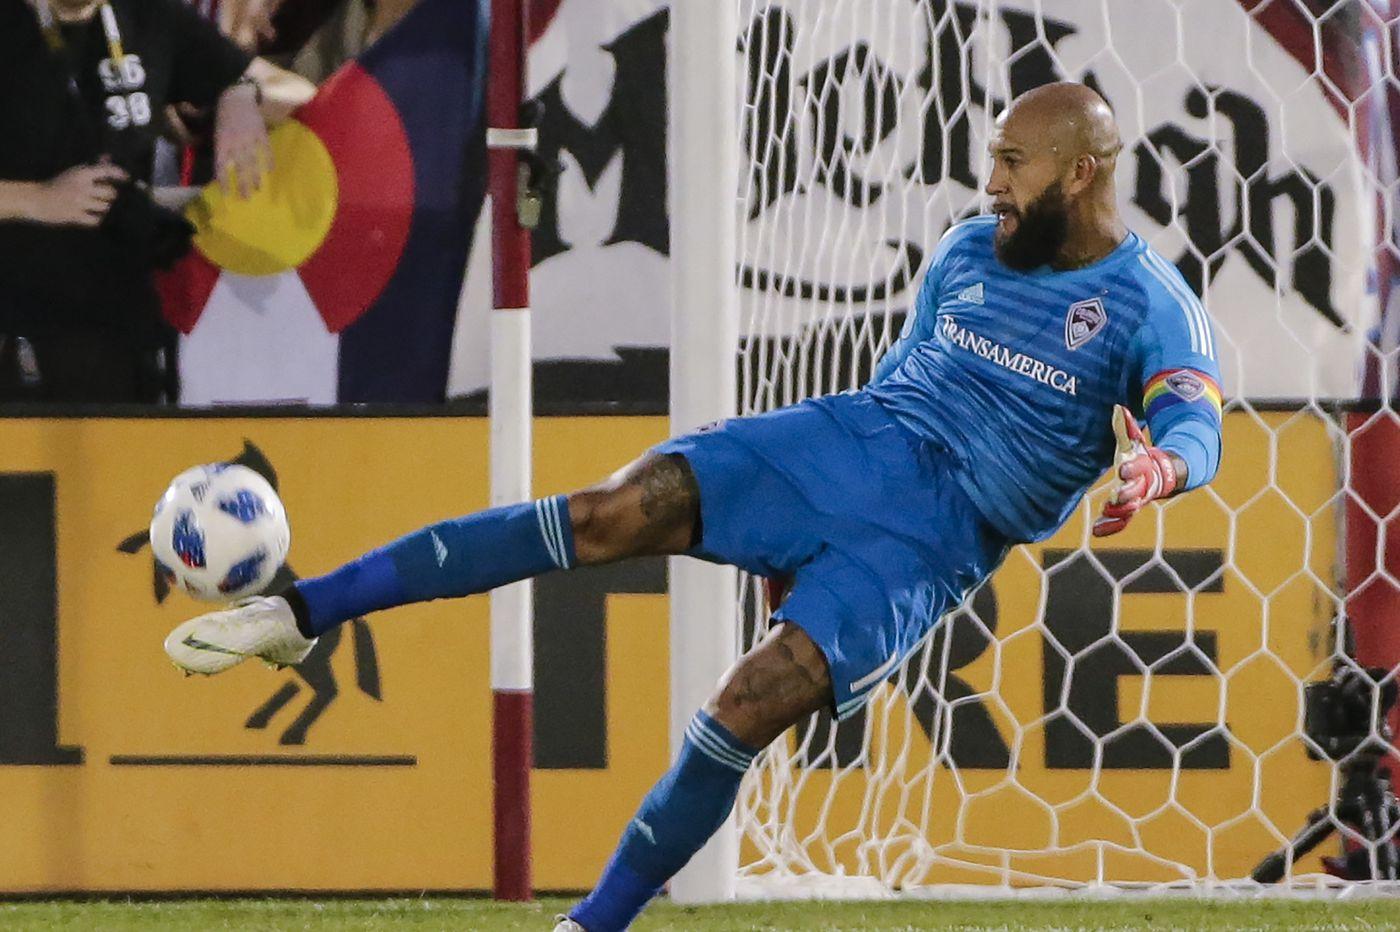 Longtime USMNT goalkeeper Tim Howard to retire at end of 2019 MLS season